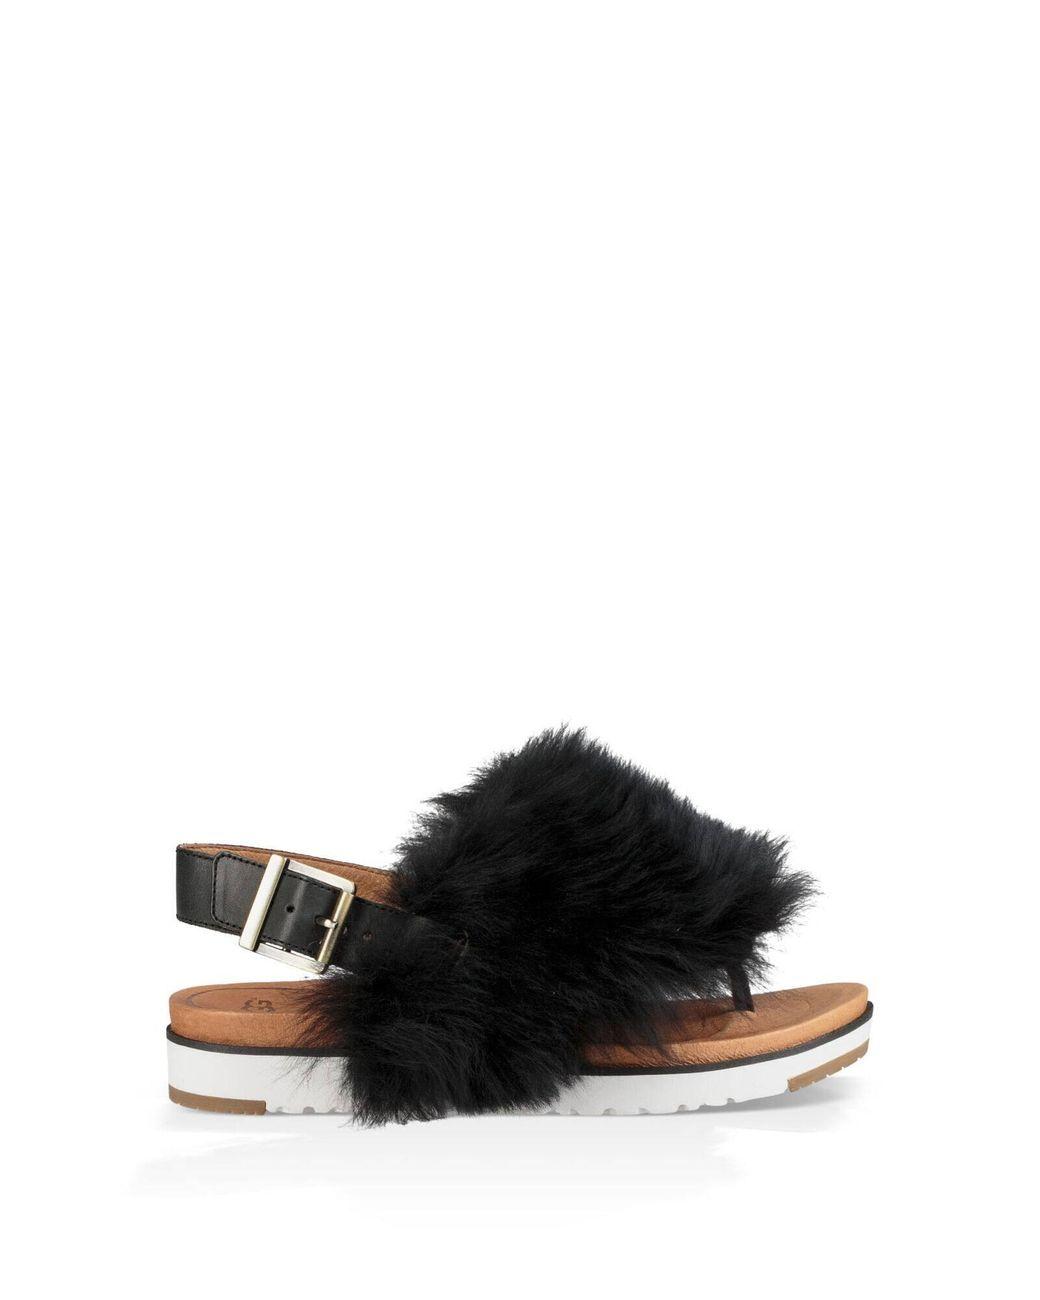 UGG Leather Holly Sandal Sheepskin in